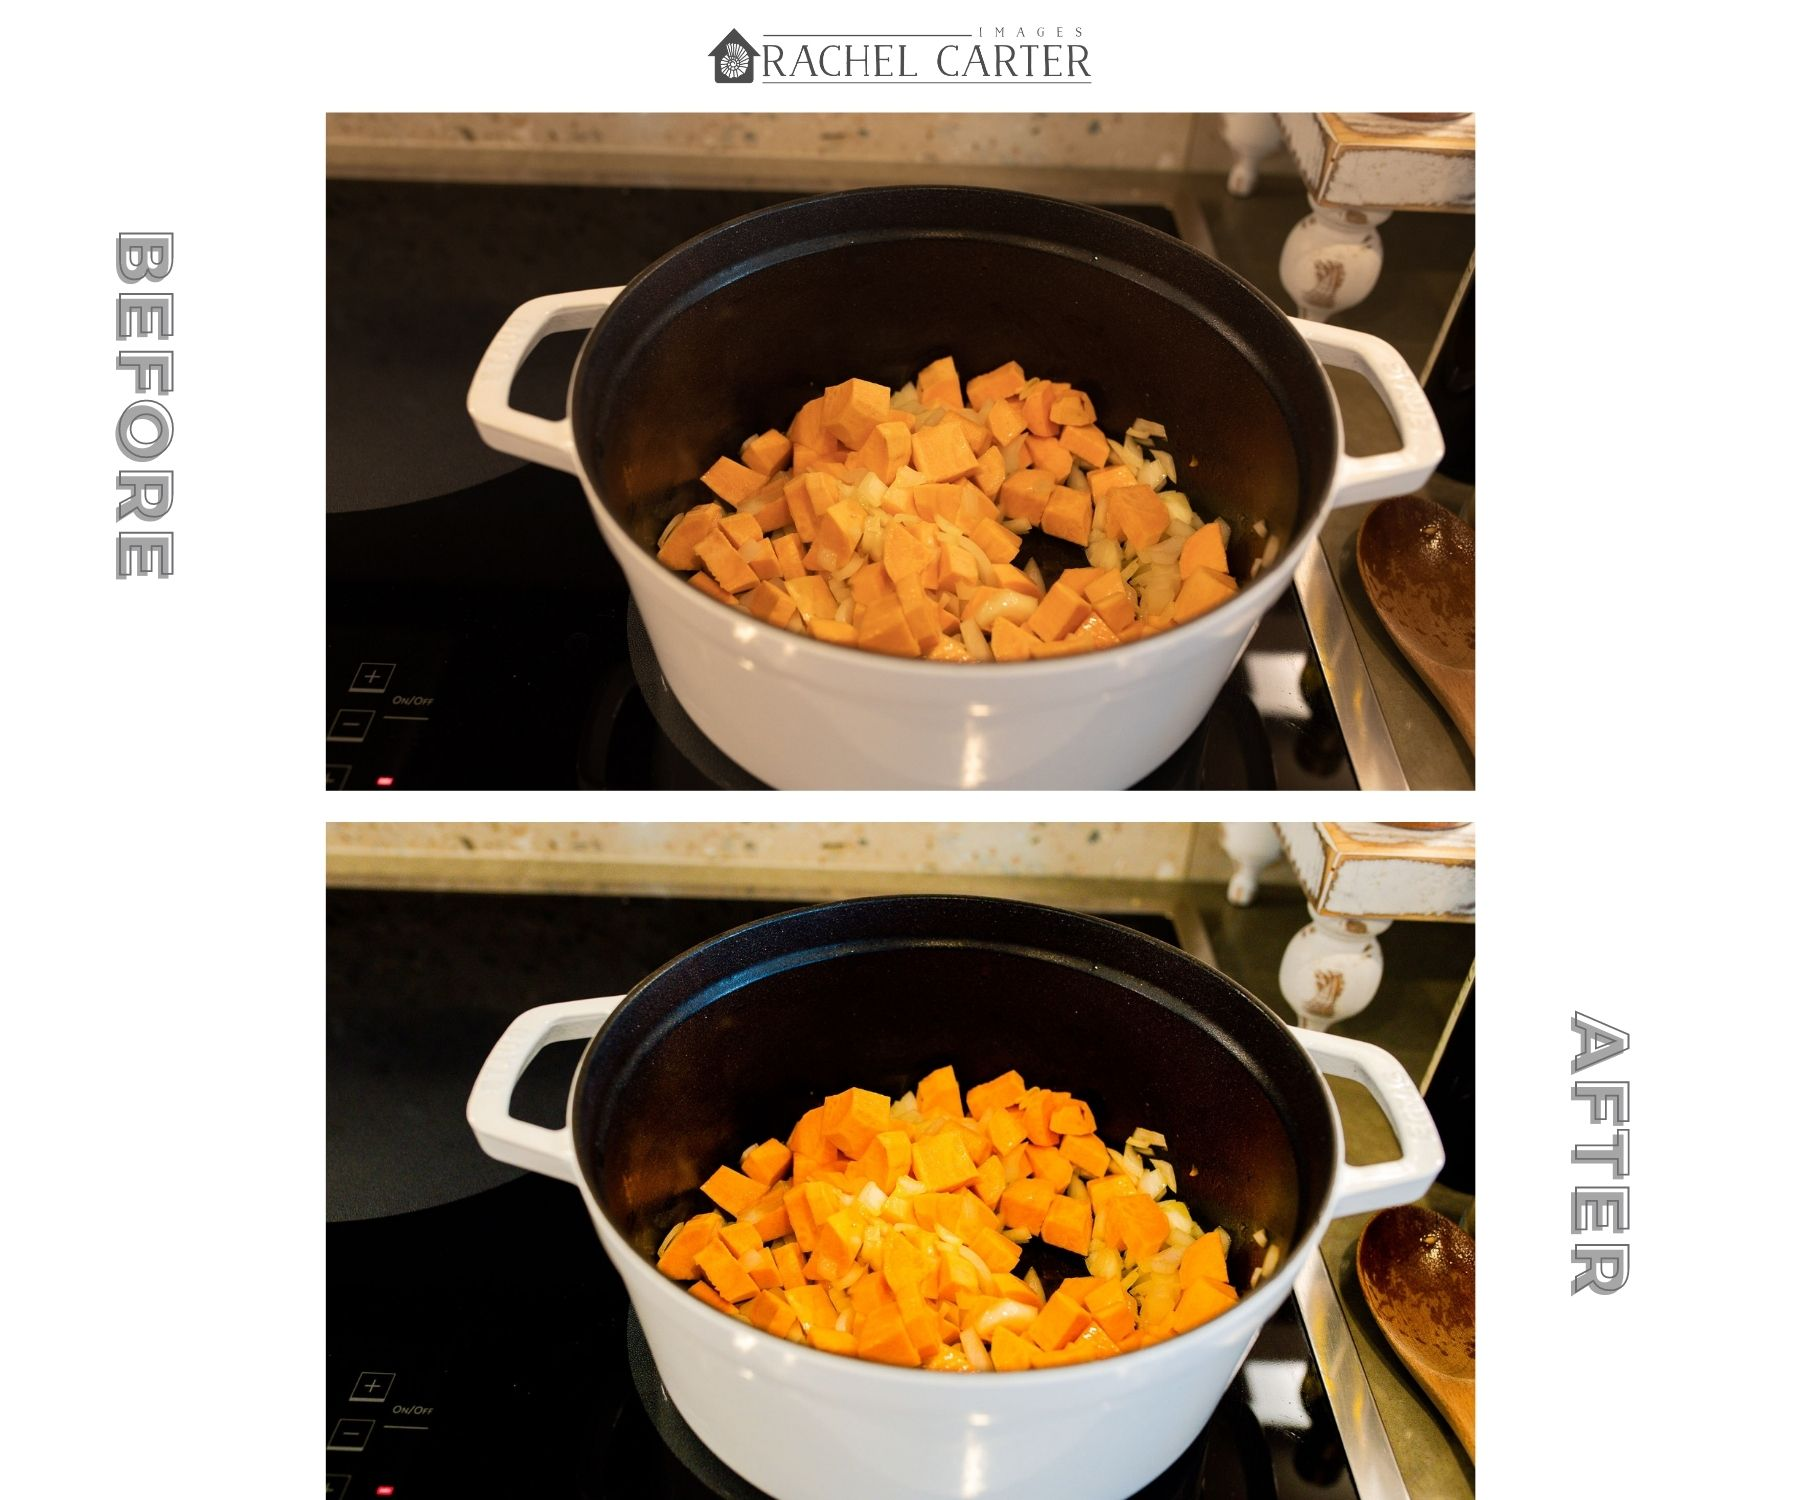 Onions & Sweet Potatoes for Chili - Food Photo Tips